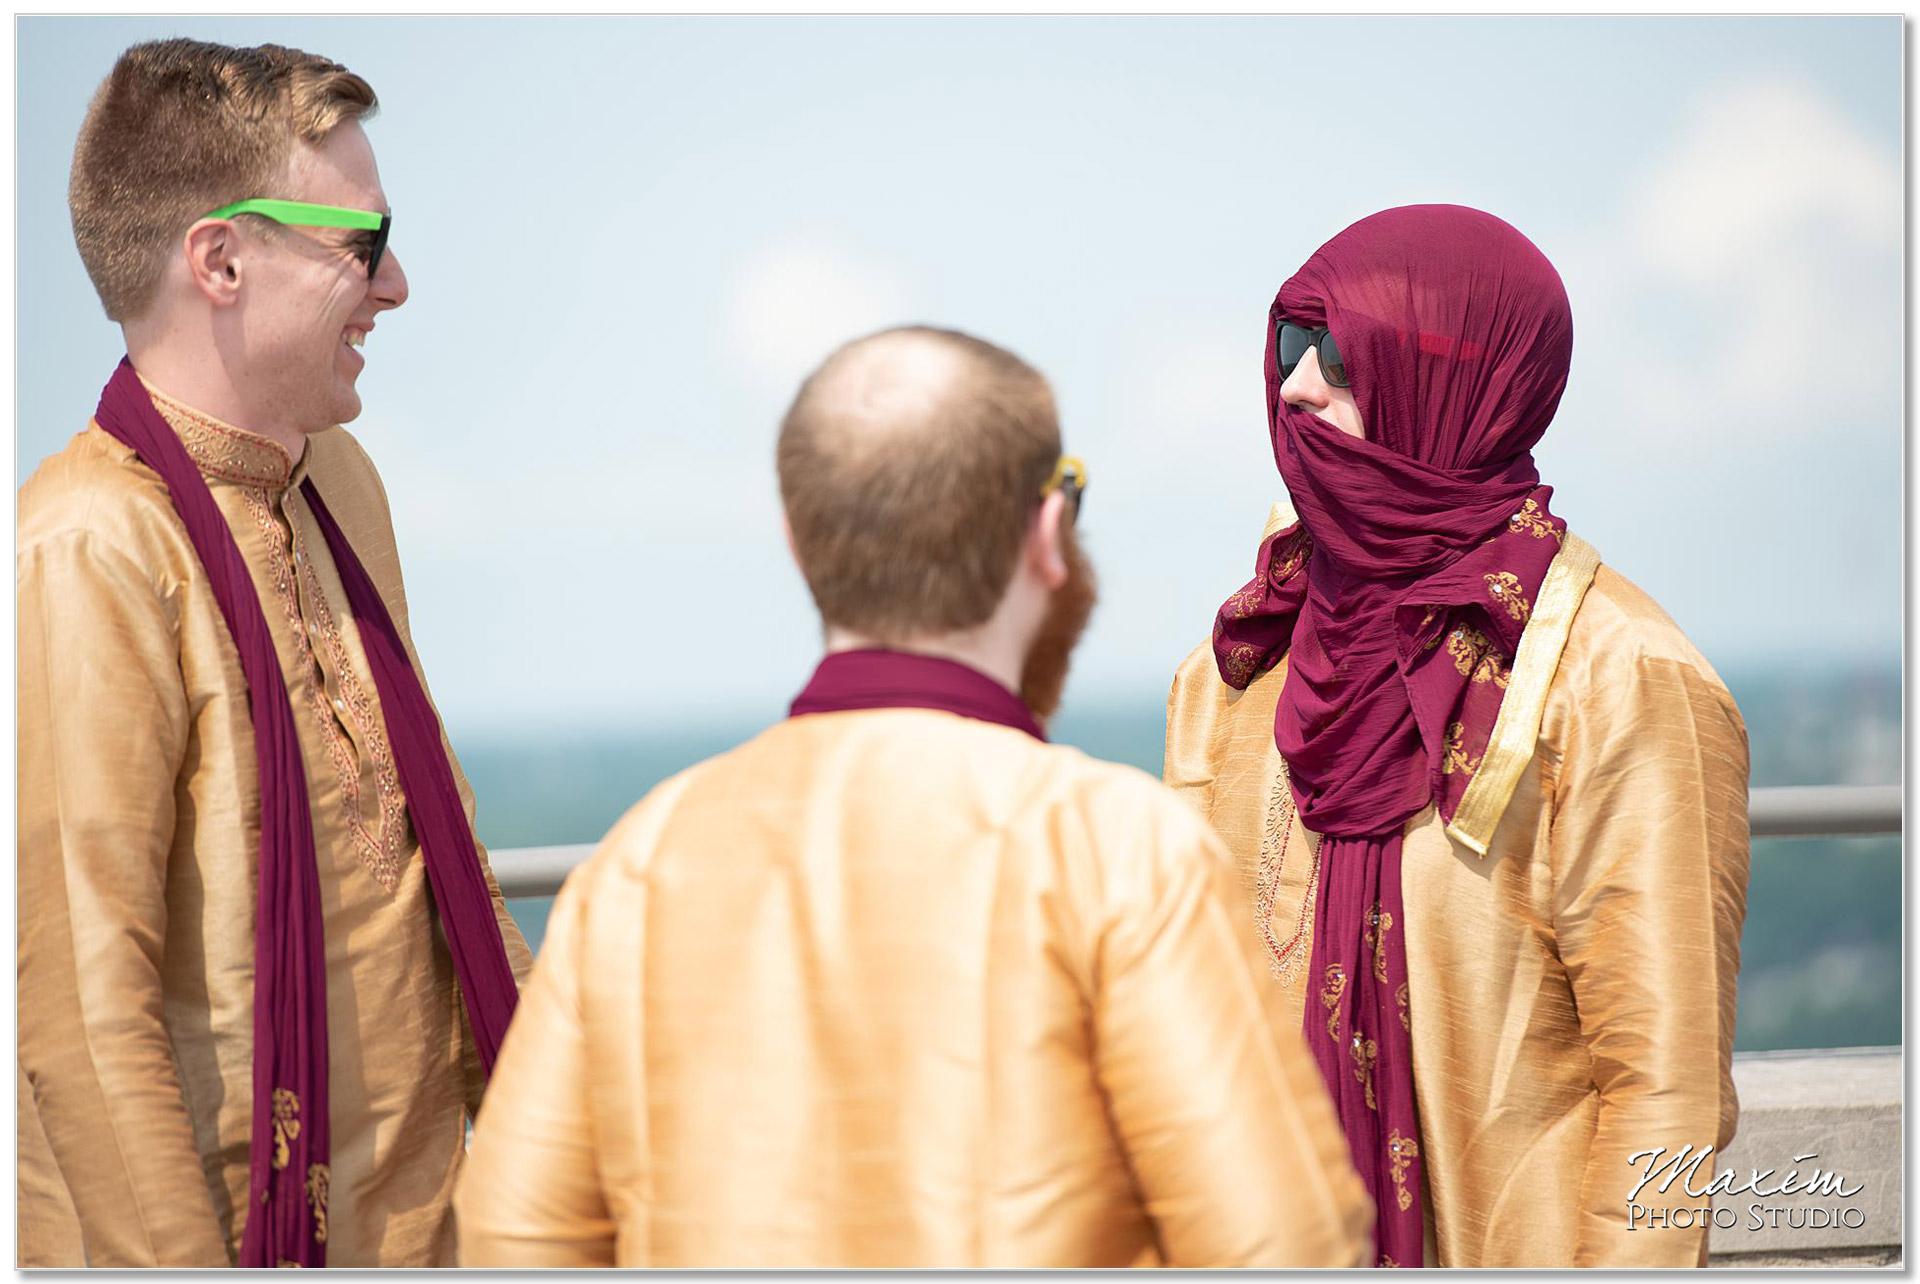 Keeping cool during Indian Wedding